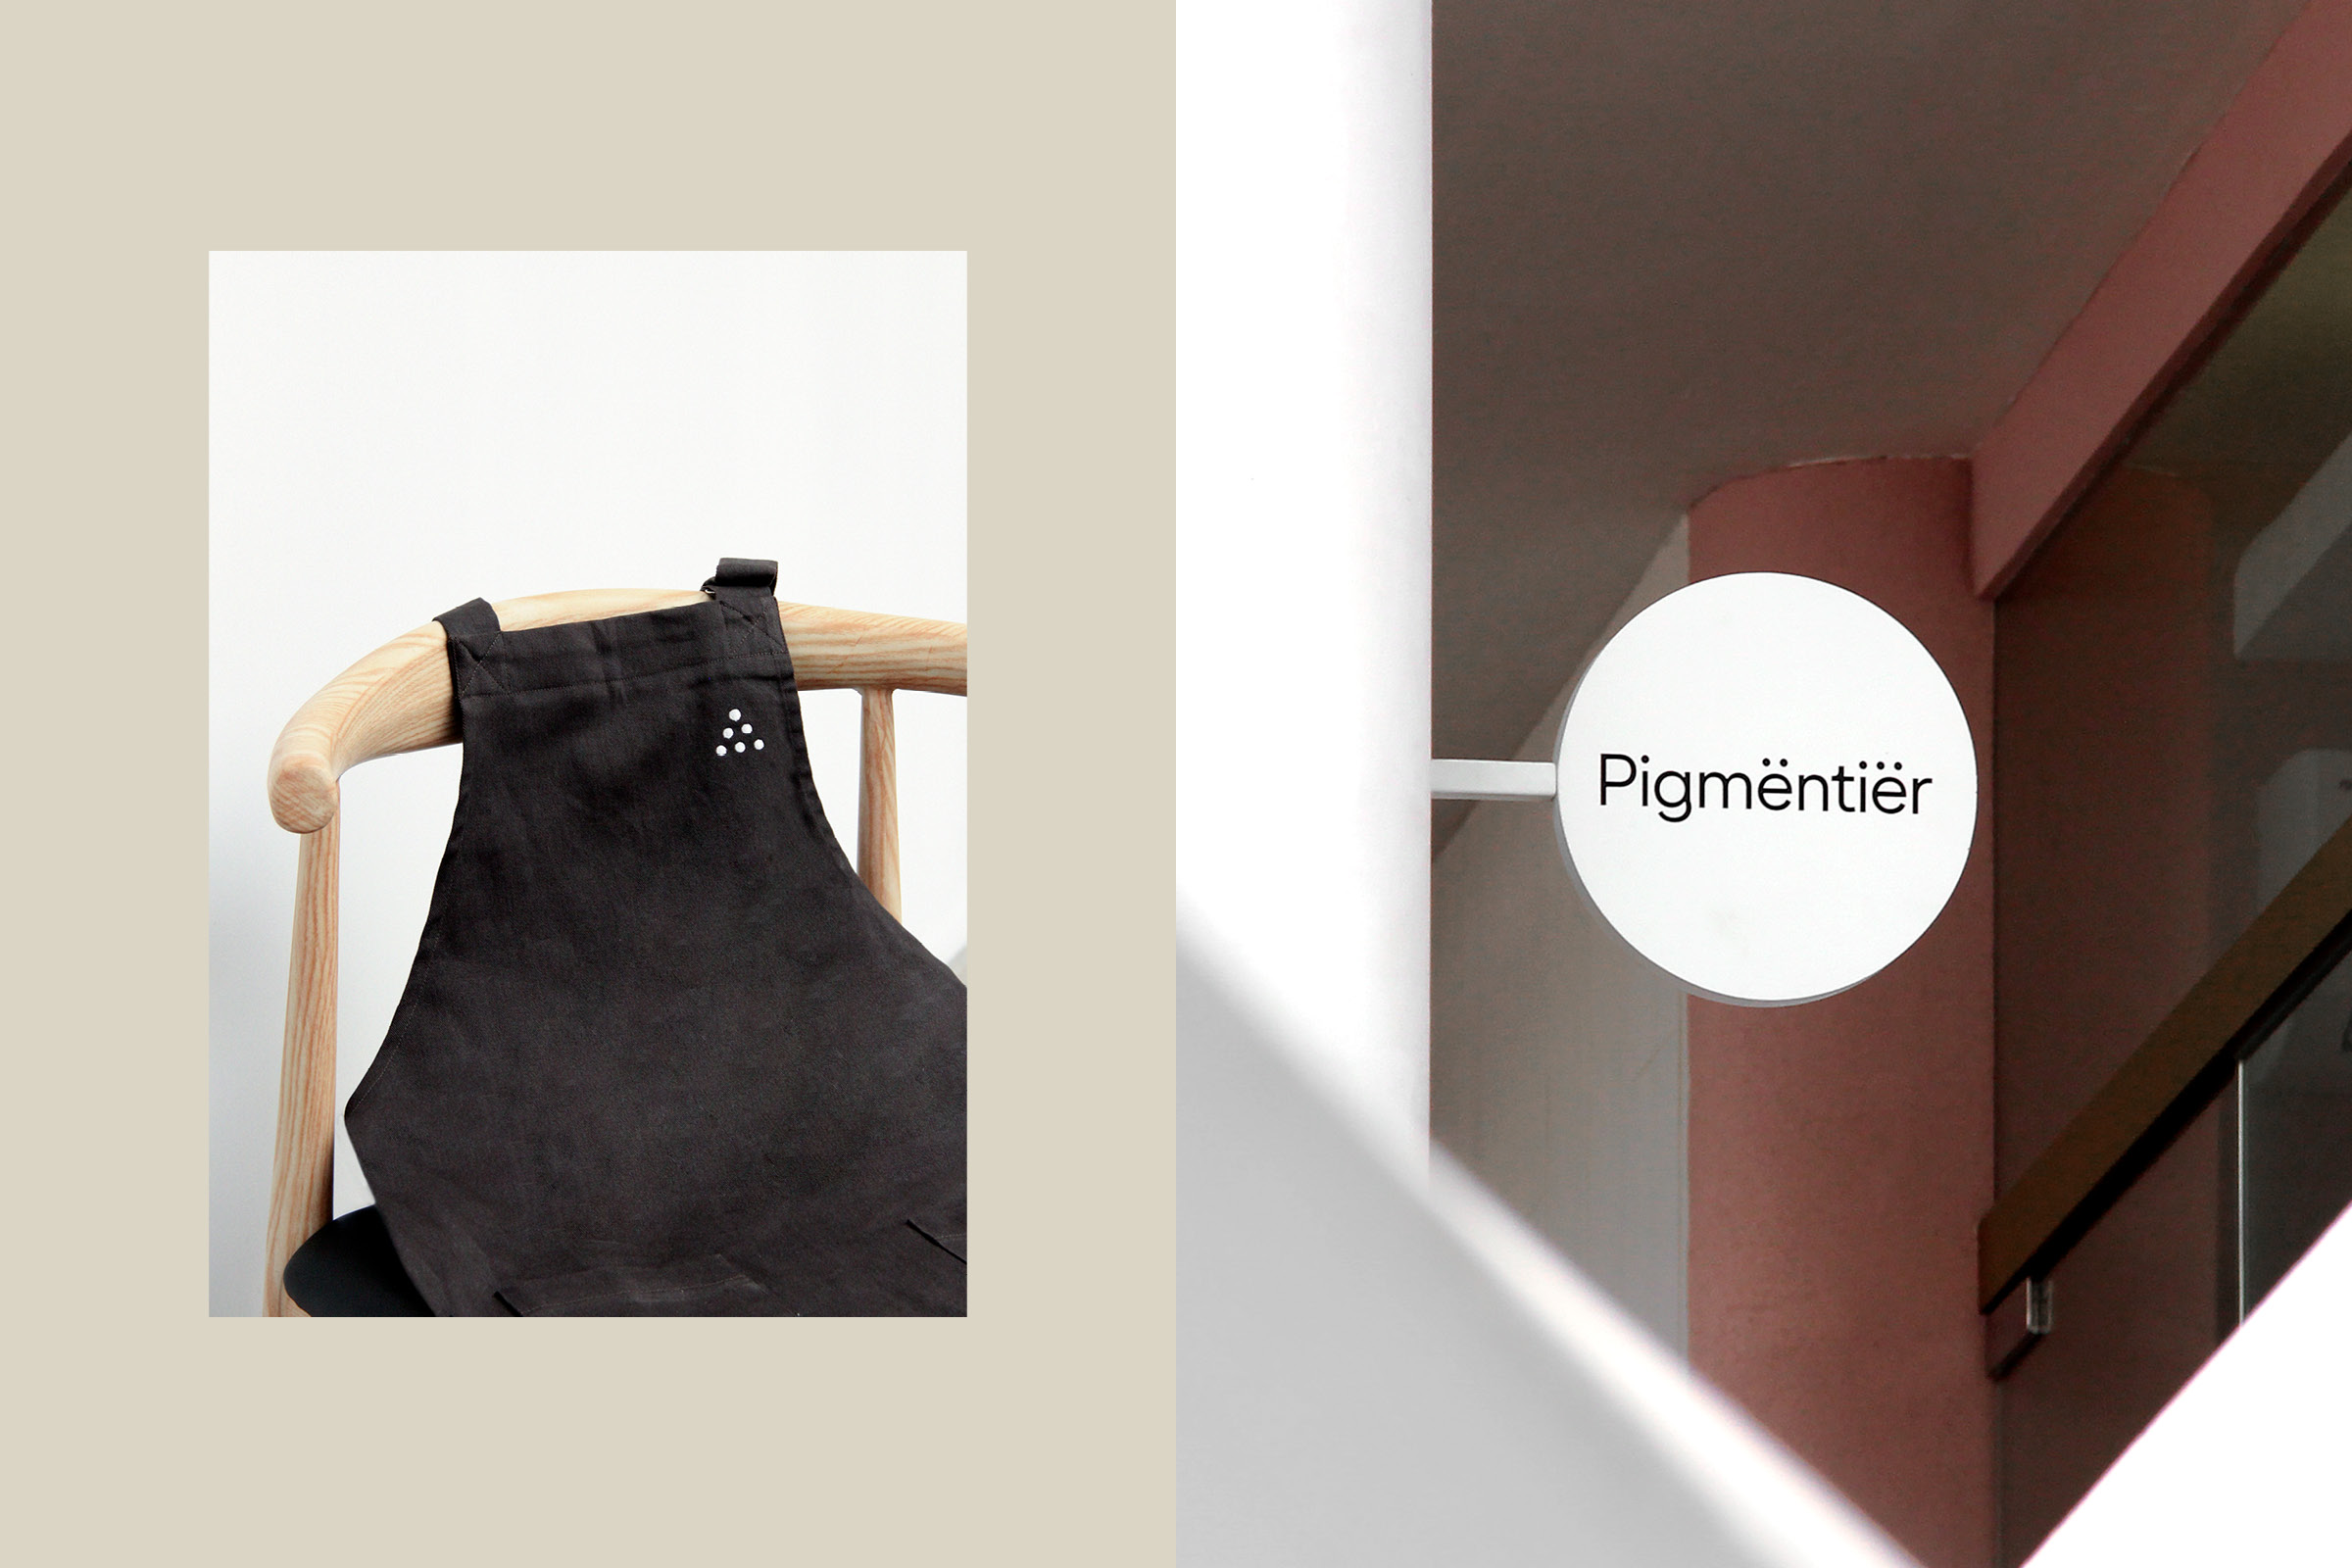 pigmentier-application4